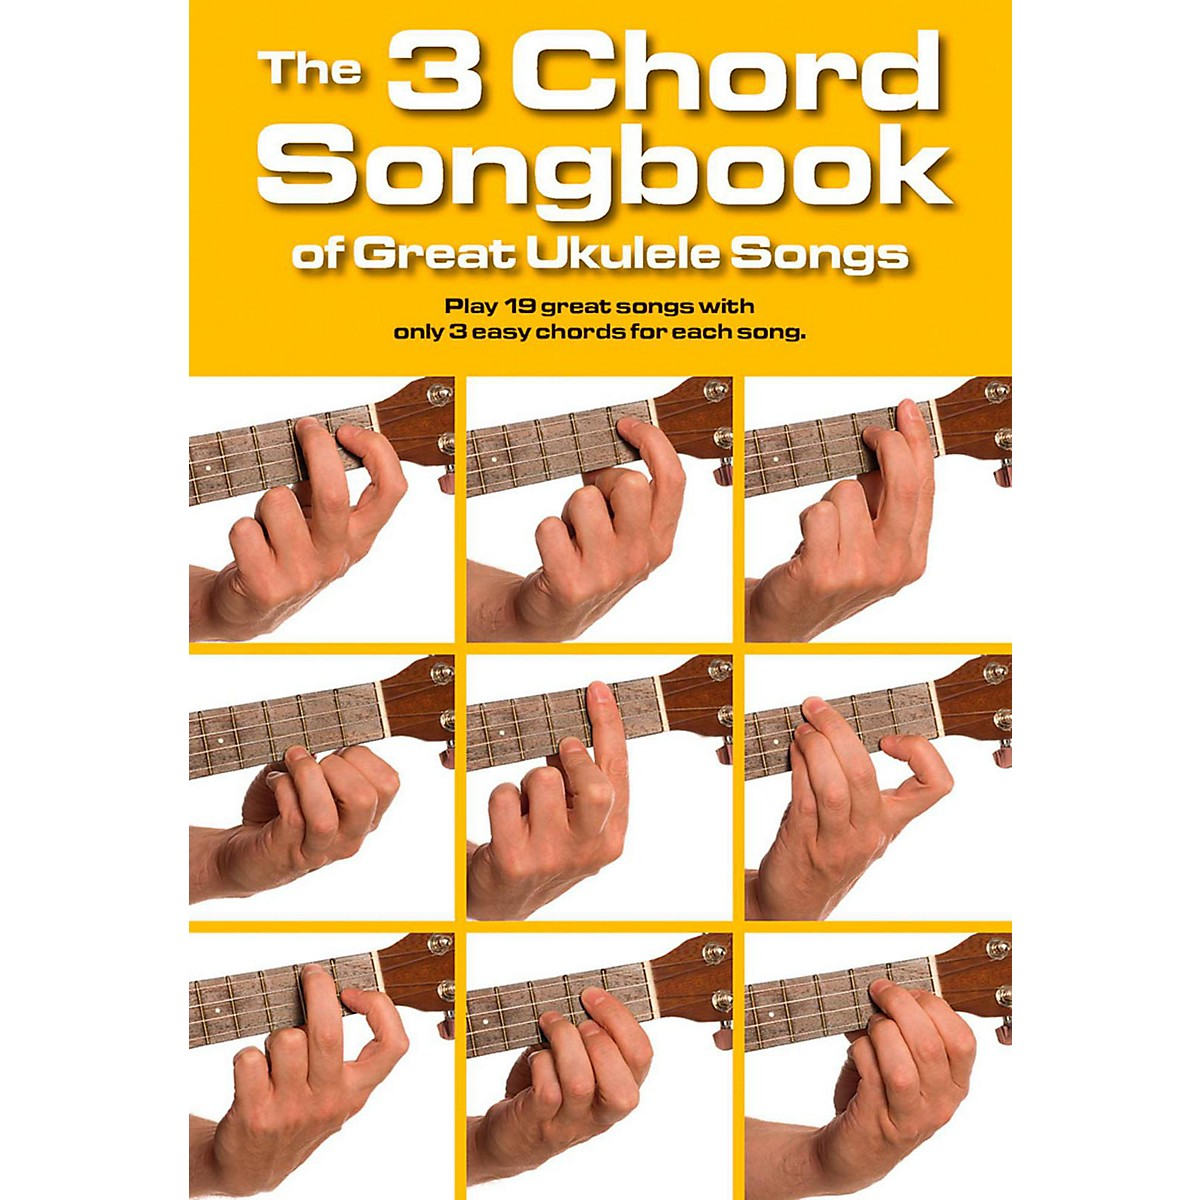 Music Sales The 3 Chord Songbook of Great Ukulele Songs